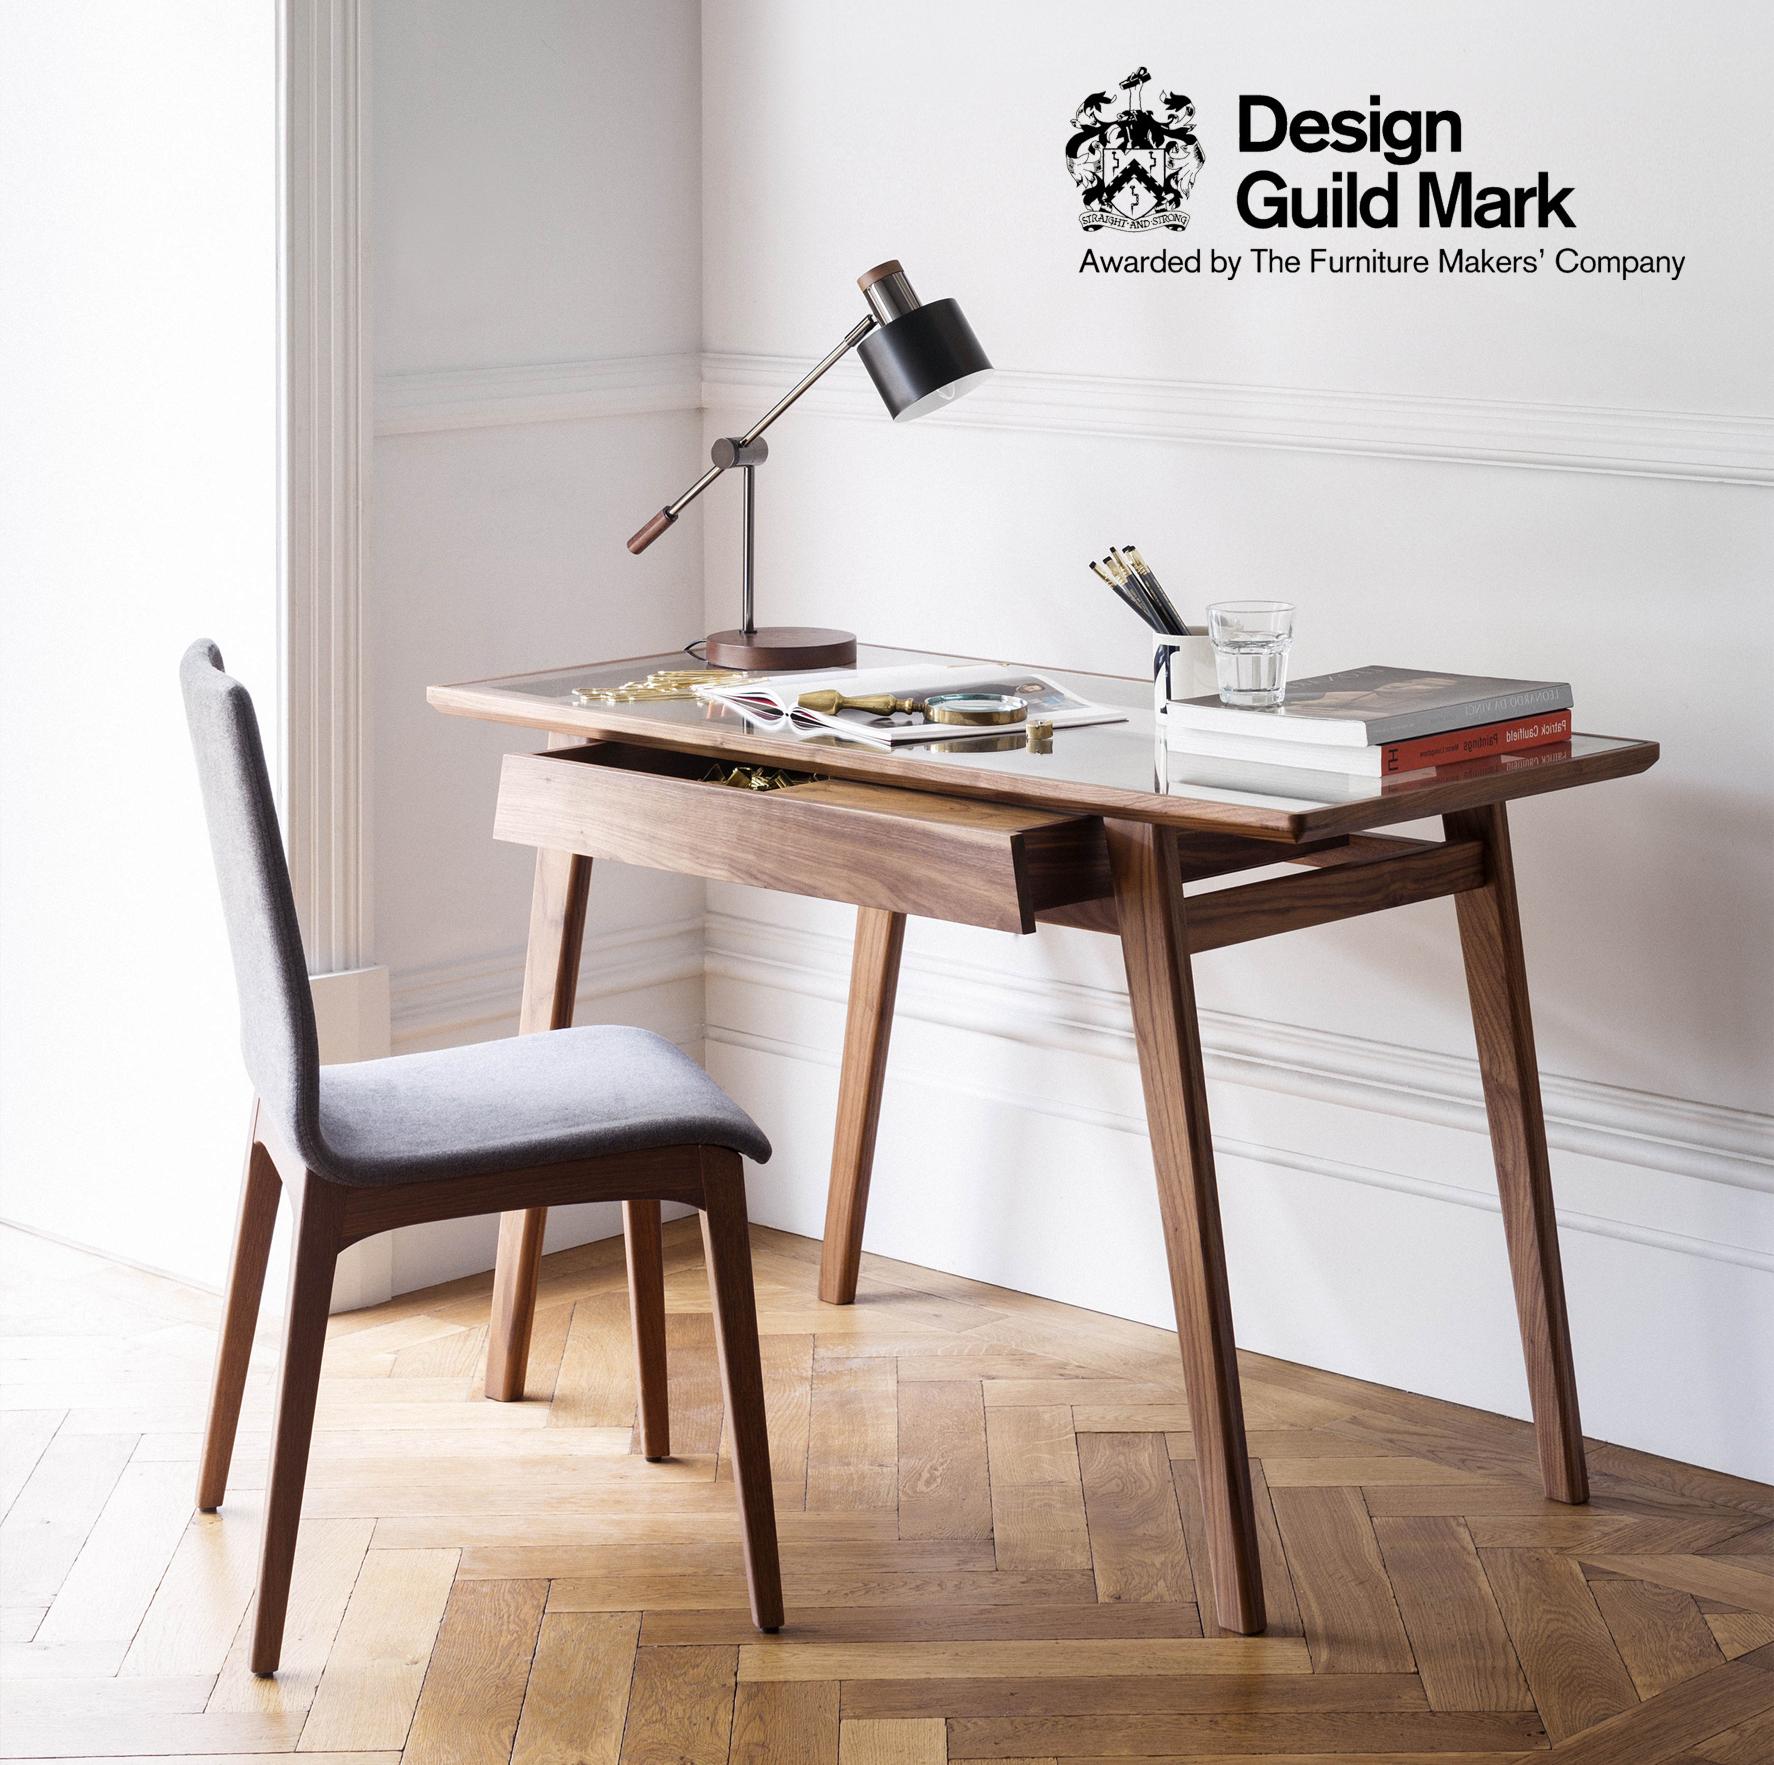 DGM: 150 - The Ashworth Desk  - designed for Conran and Marks & Spencer